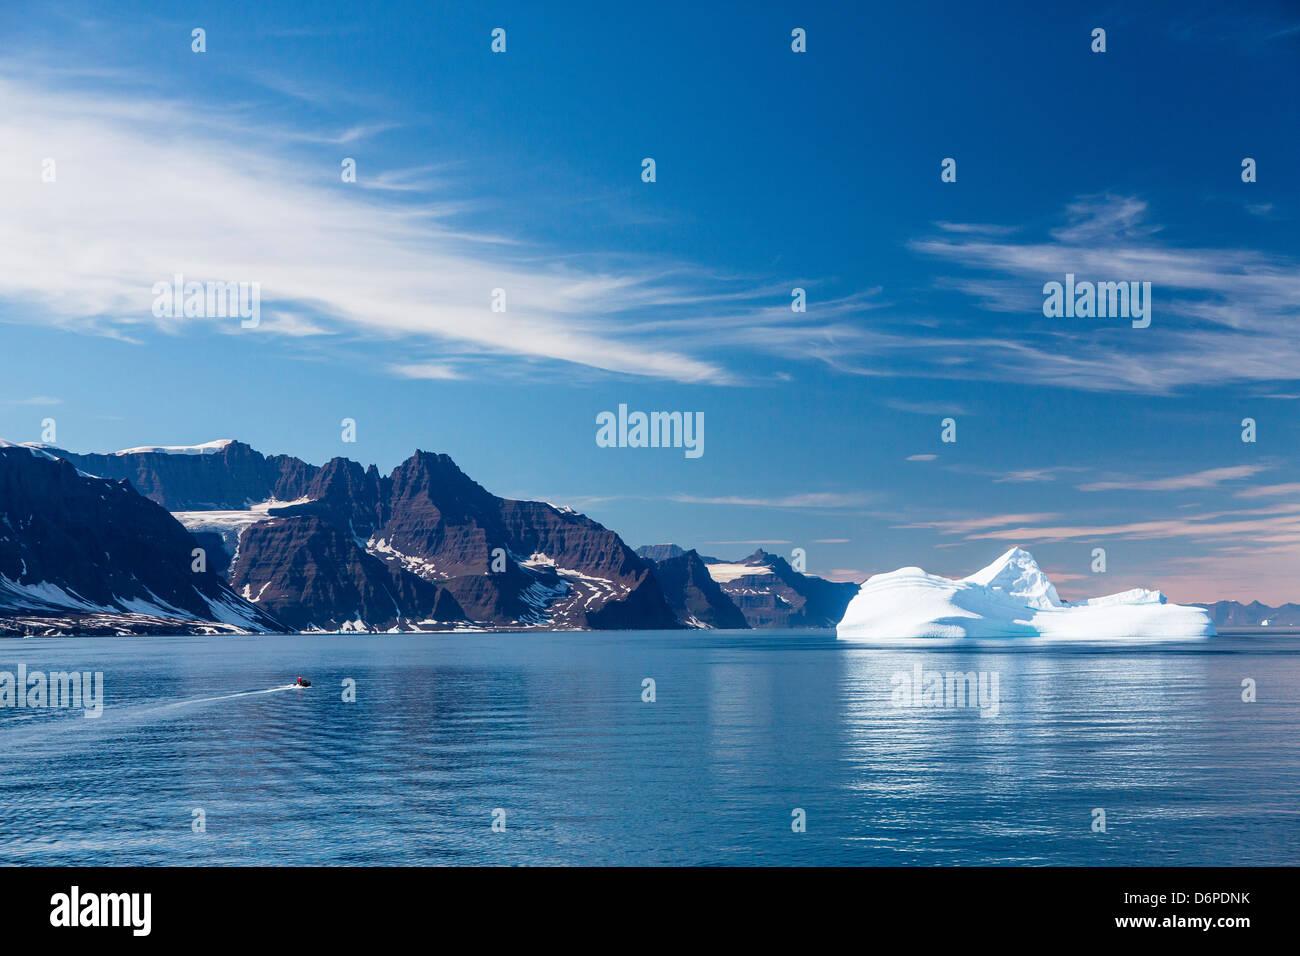 Huge iceberg, Zodiac, Scoresbysund, Northeast Greenland, Polar Regions - Stock Image